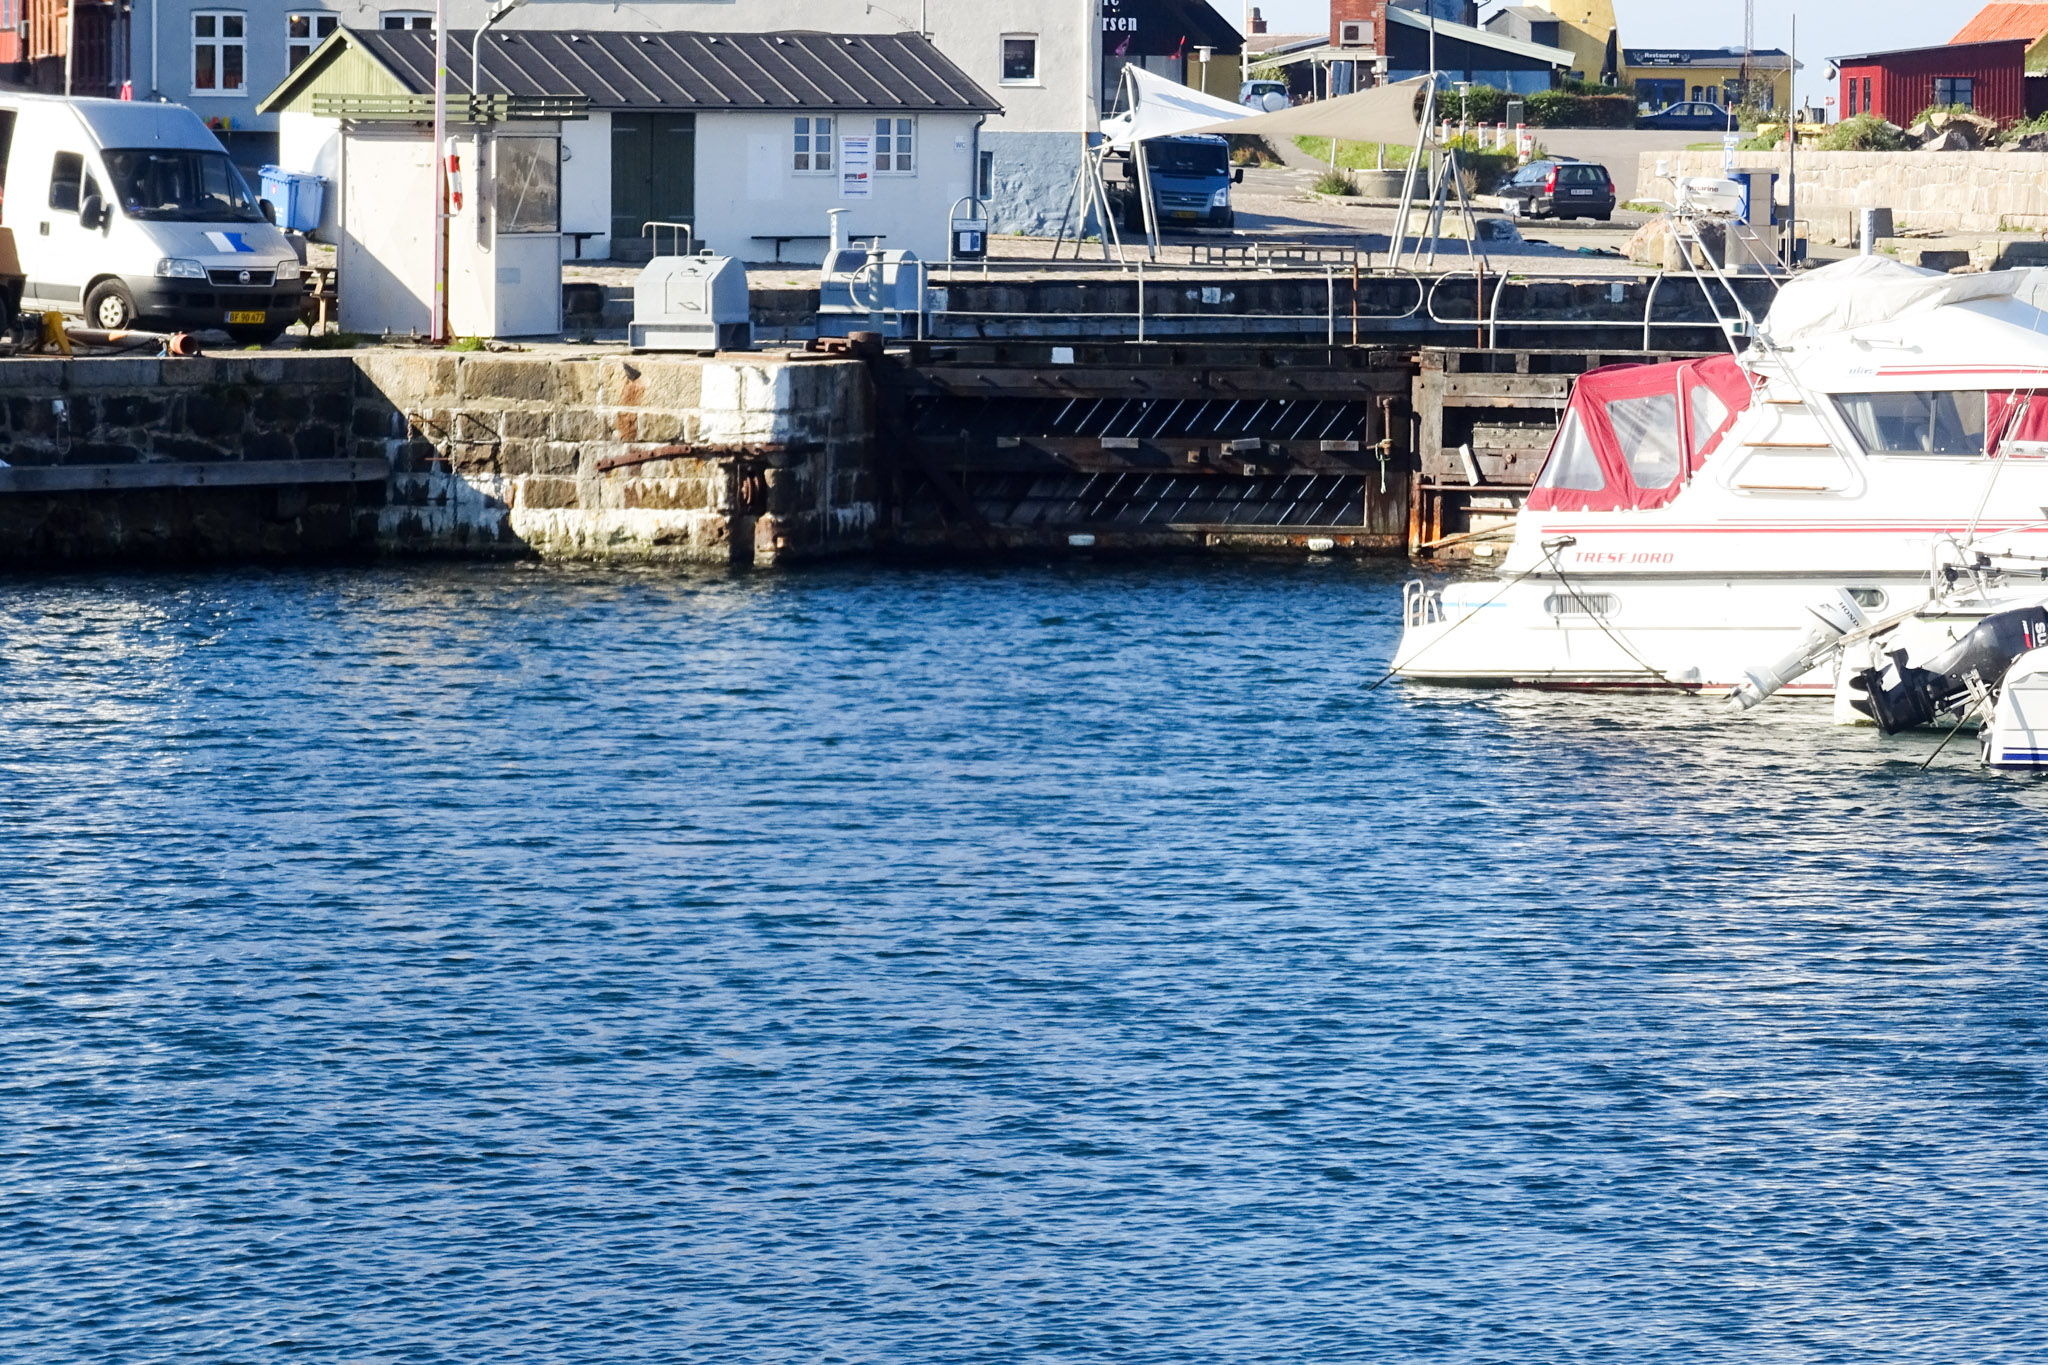 Geschlossene Tore im Hafen